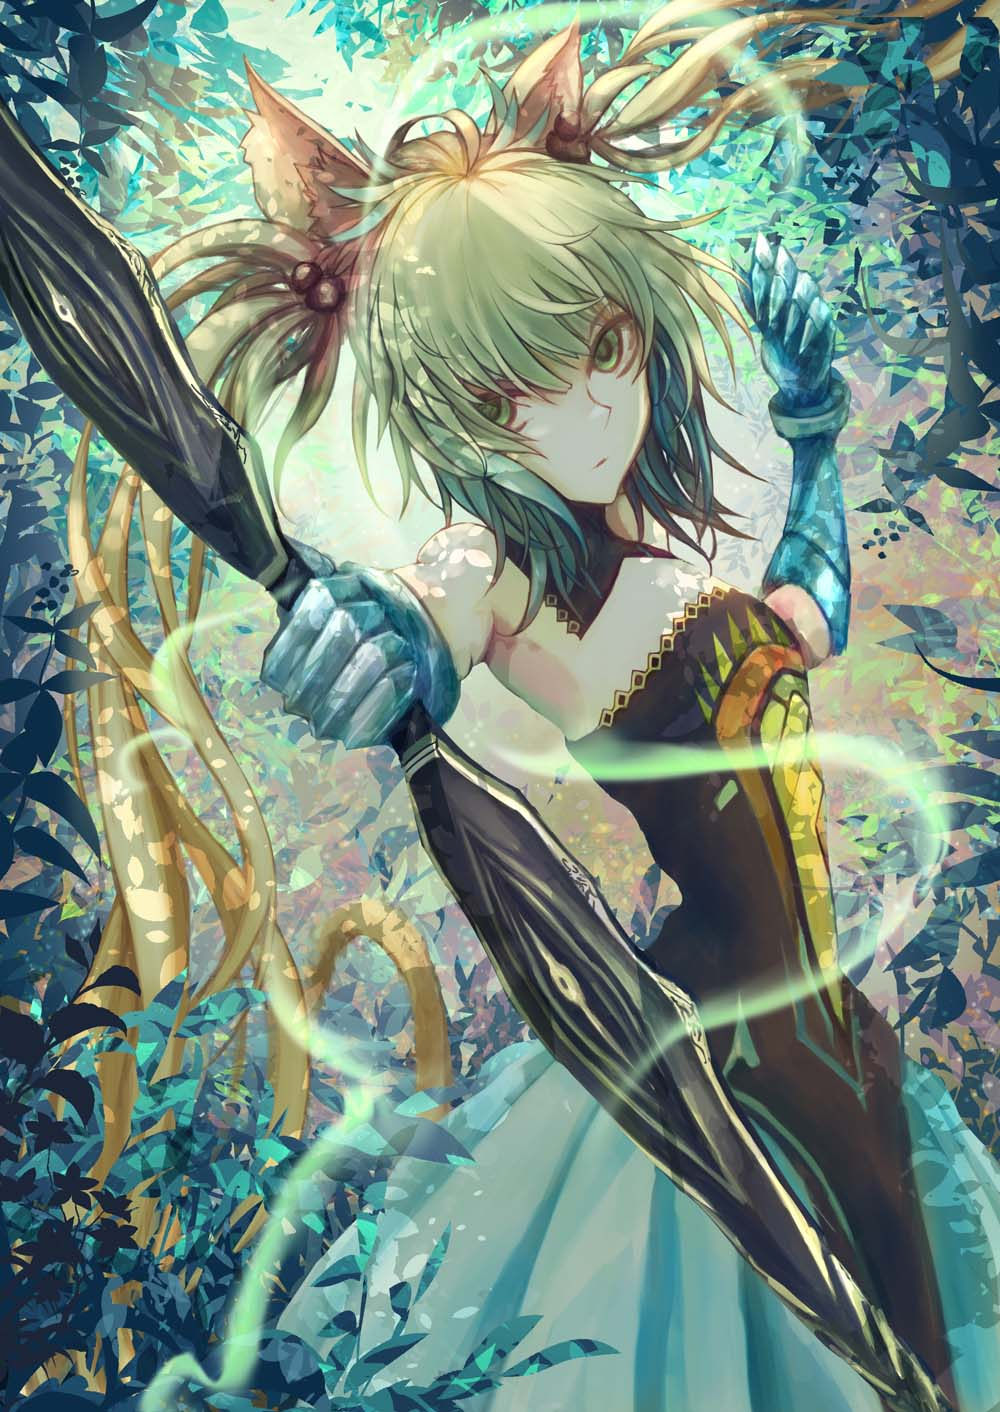 Fate/Apocrypha 阿塔兰忒 手机壁纸美图合集